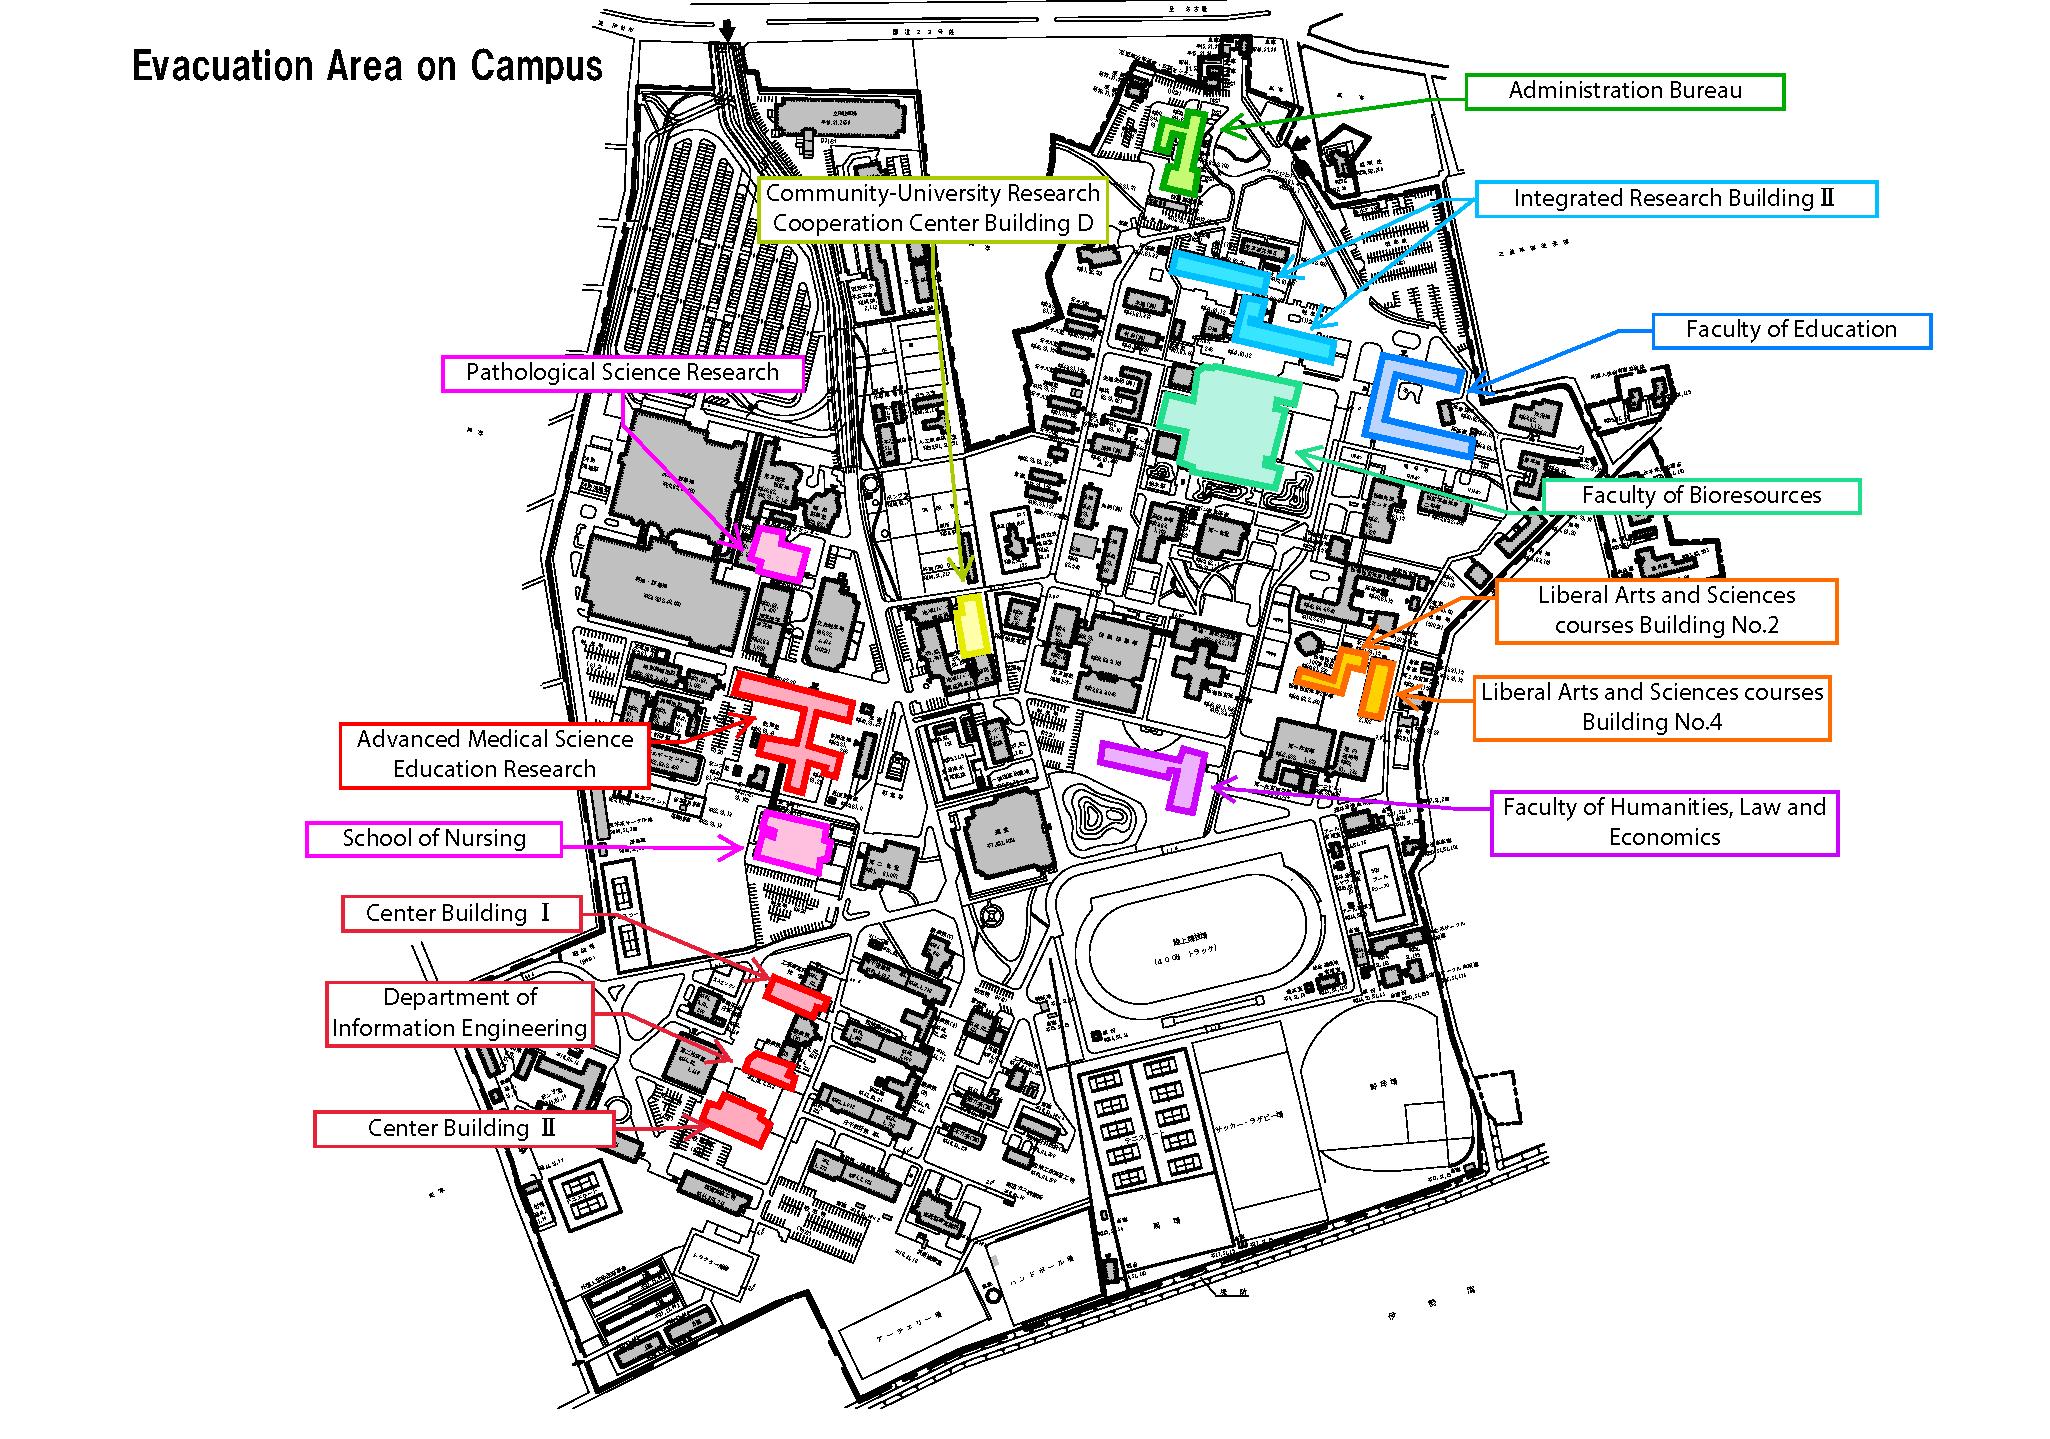 evacuation area.png